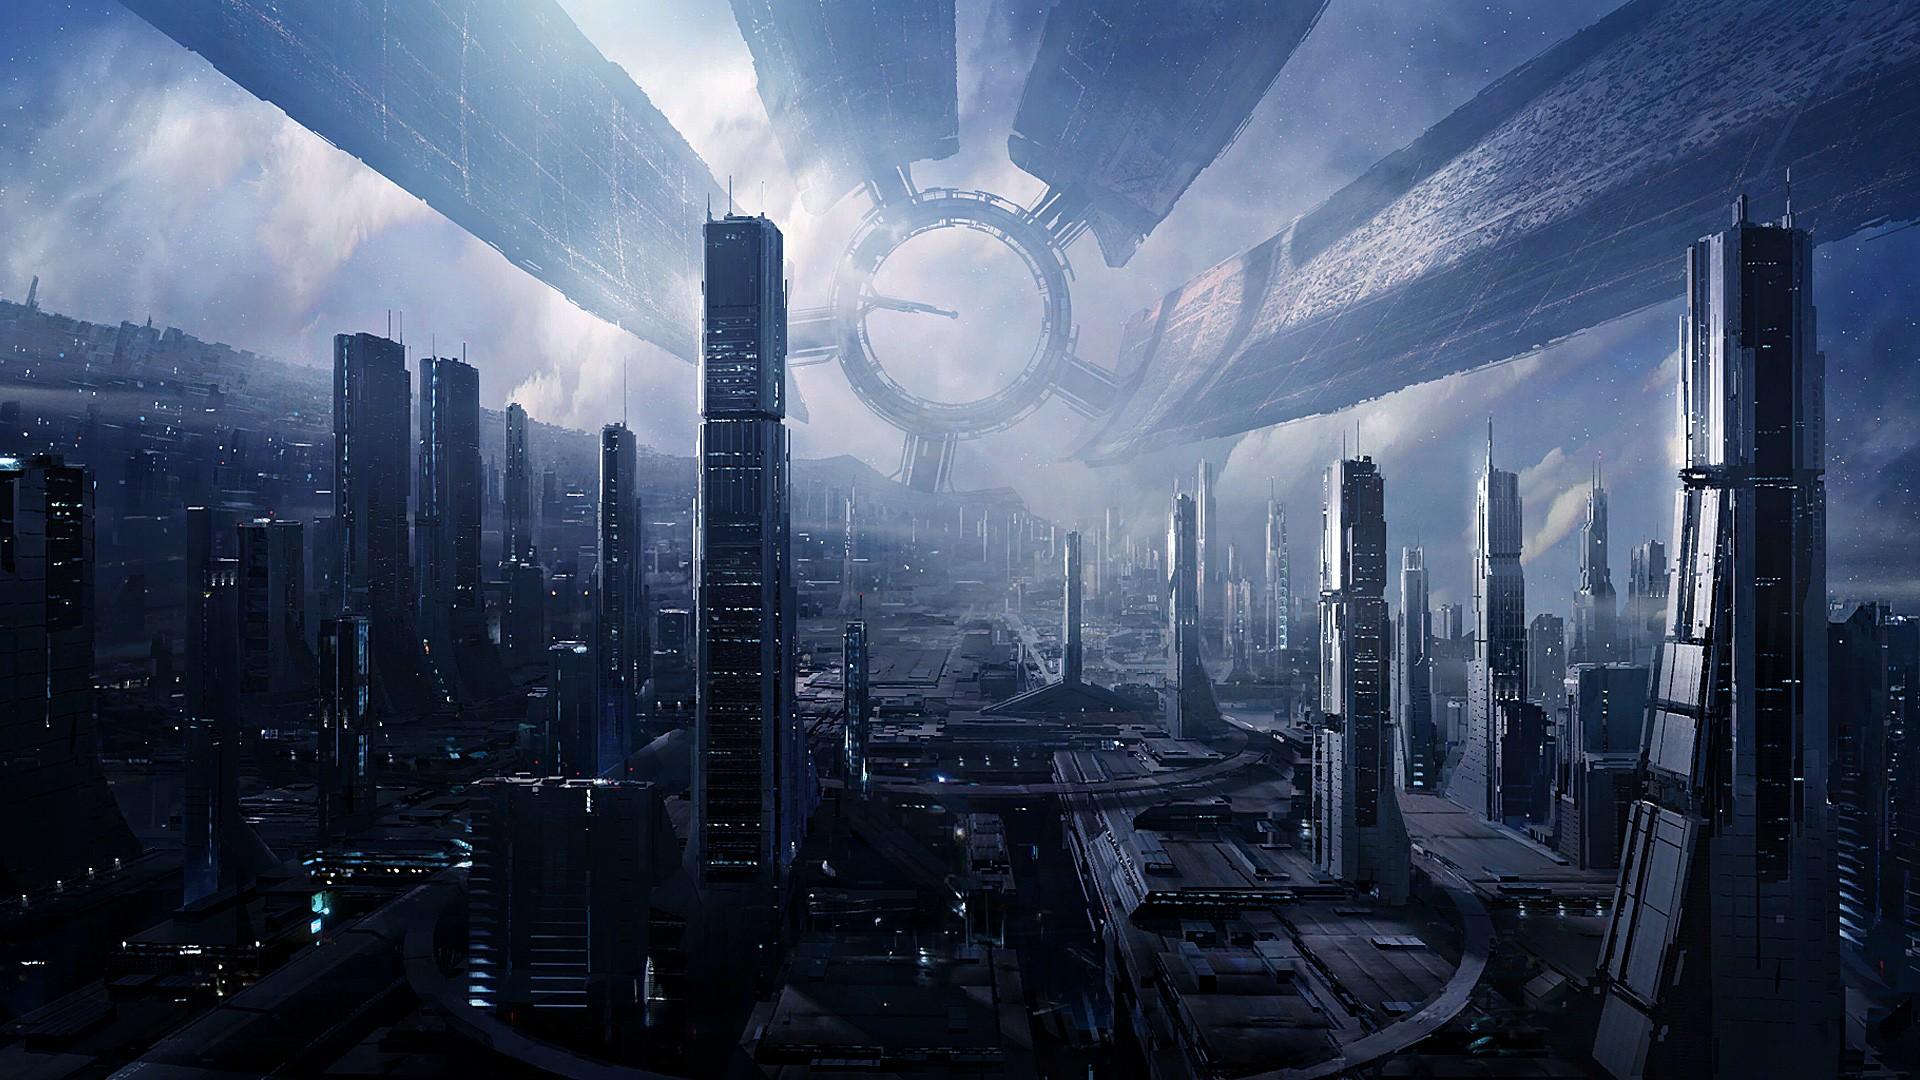 General 1920x1080 futuristic Mass Effect Citadel space nebula space station cityscape skyscraper digital art Citadel (Mass Effect) Mass Effect 3 Mass Effect 2 concept art city science fiction aliens technology